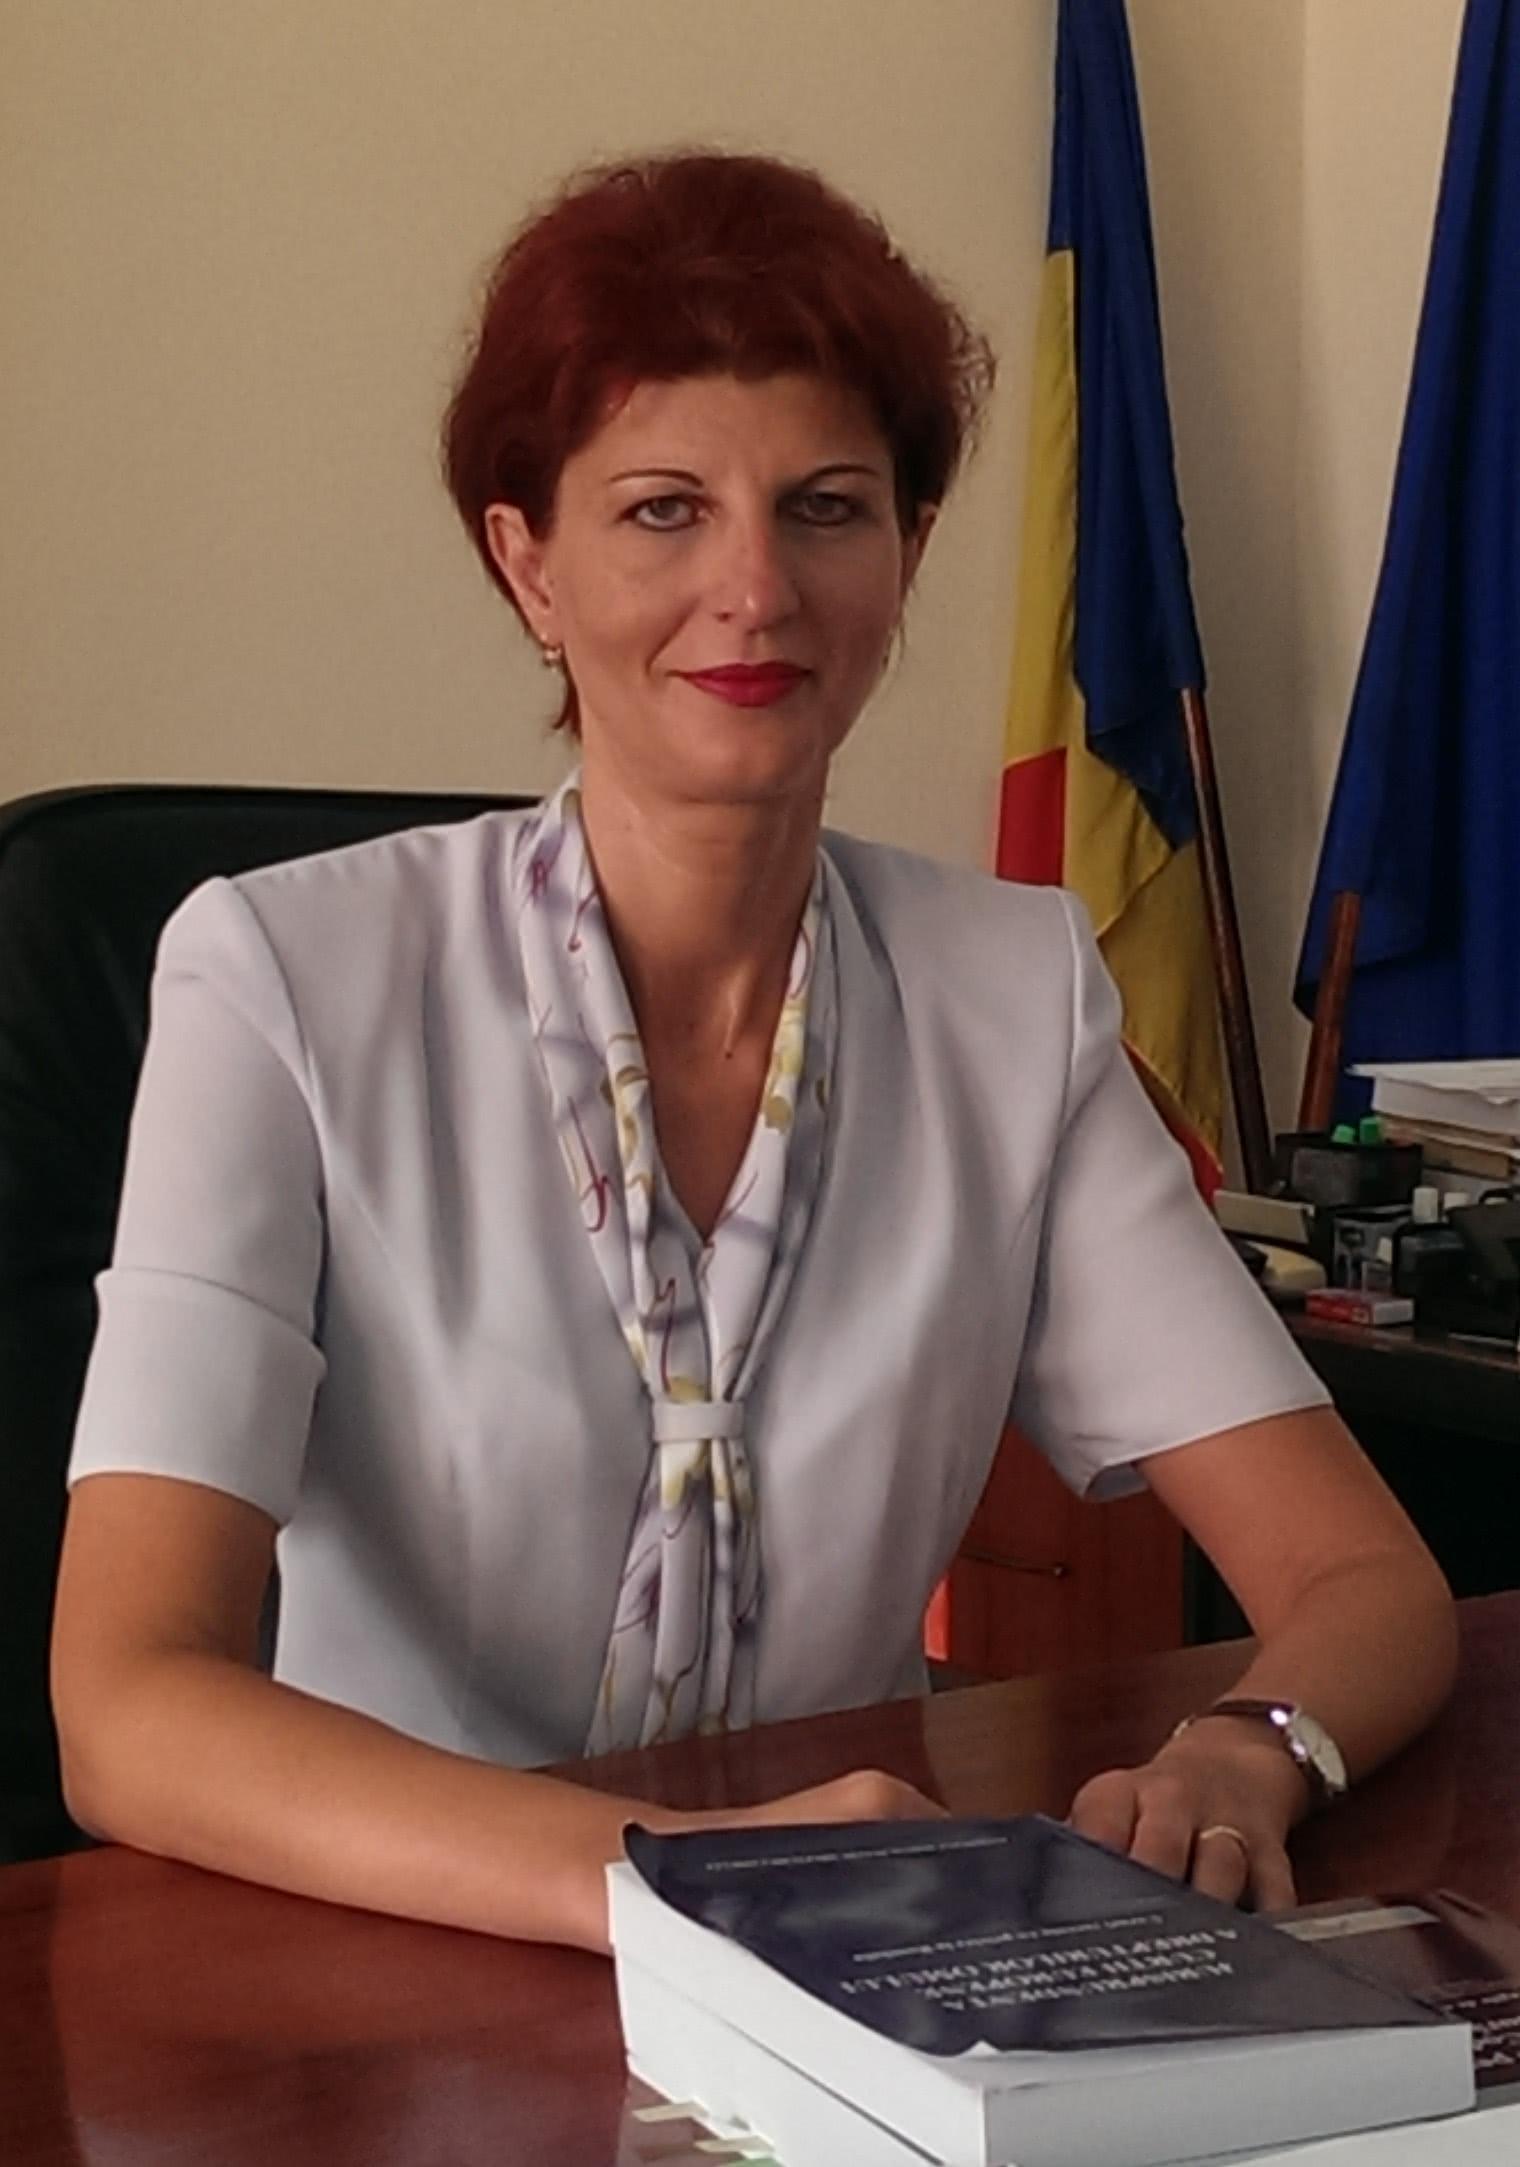 judecator Nicoleta Margareta Țînț, candidat CSM 2016